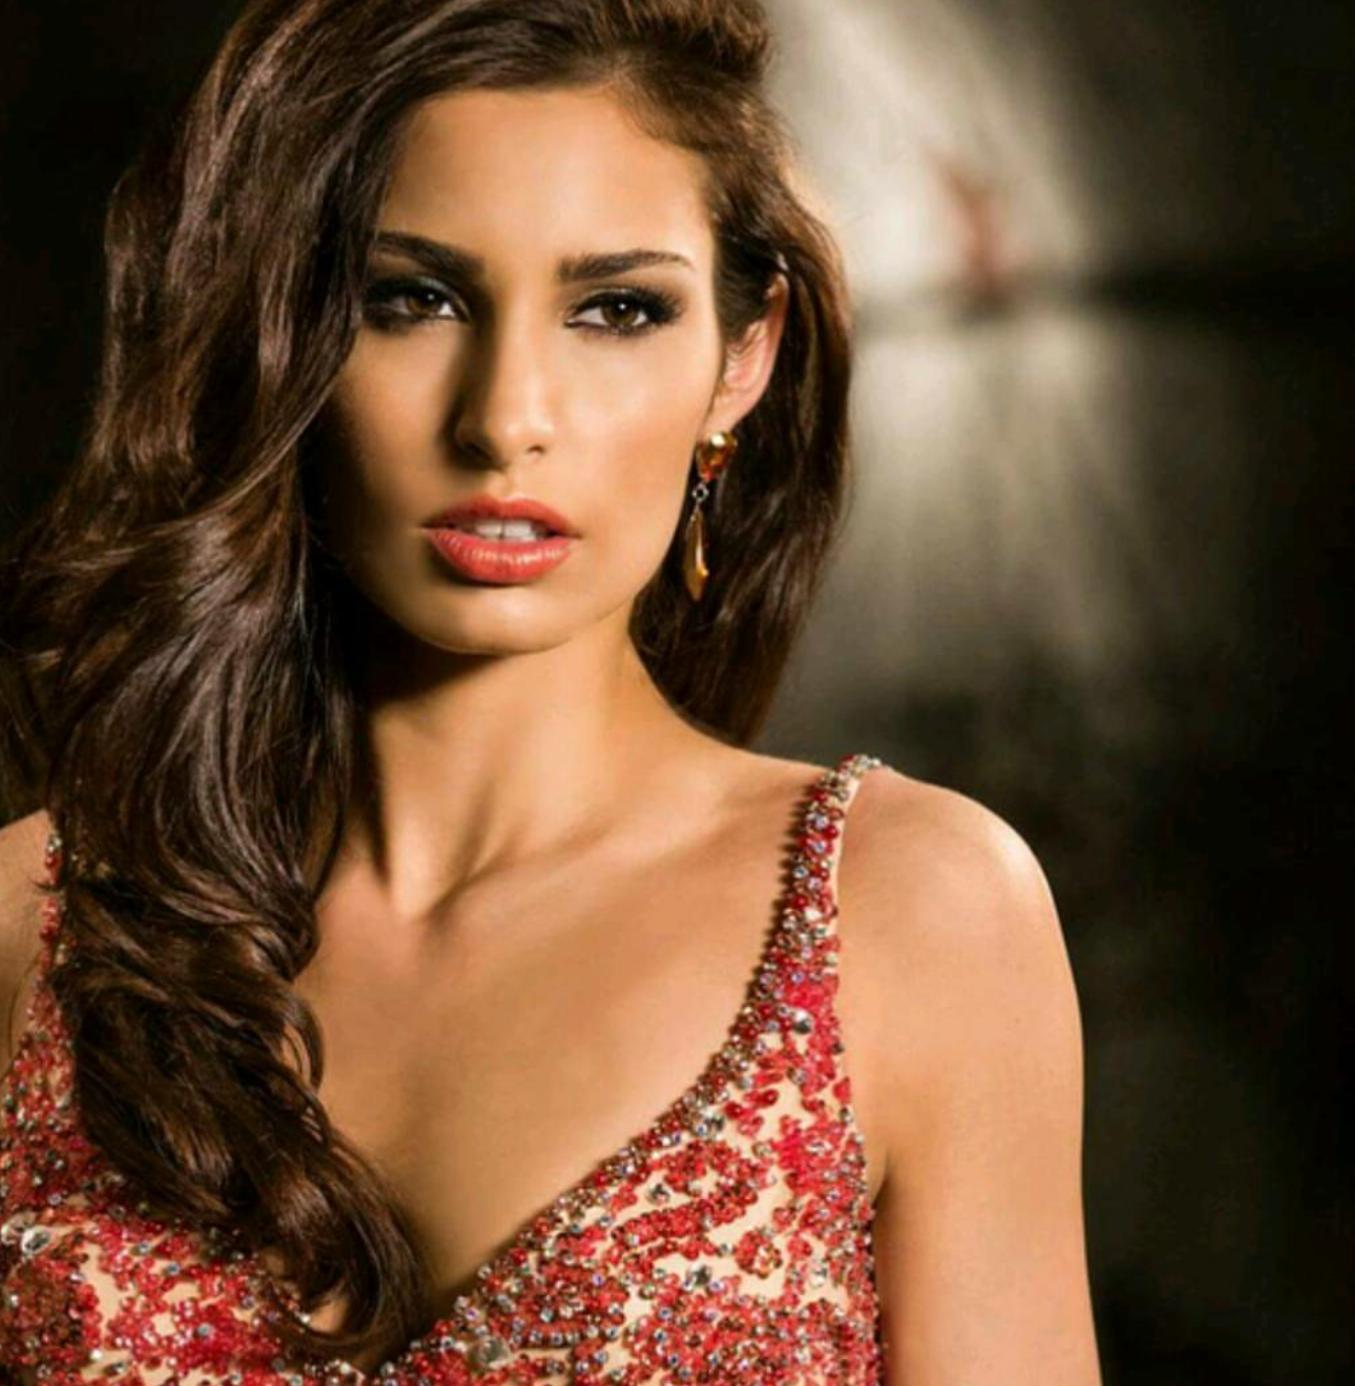 Miss Maryland USA 2014